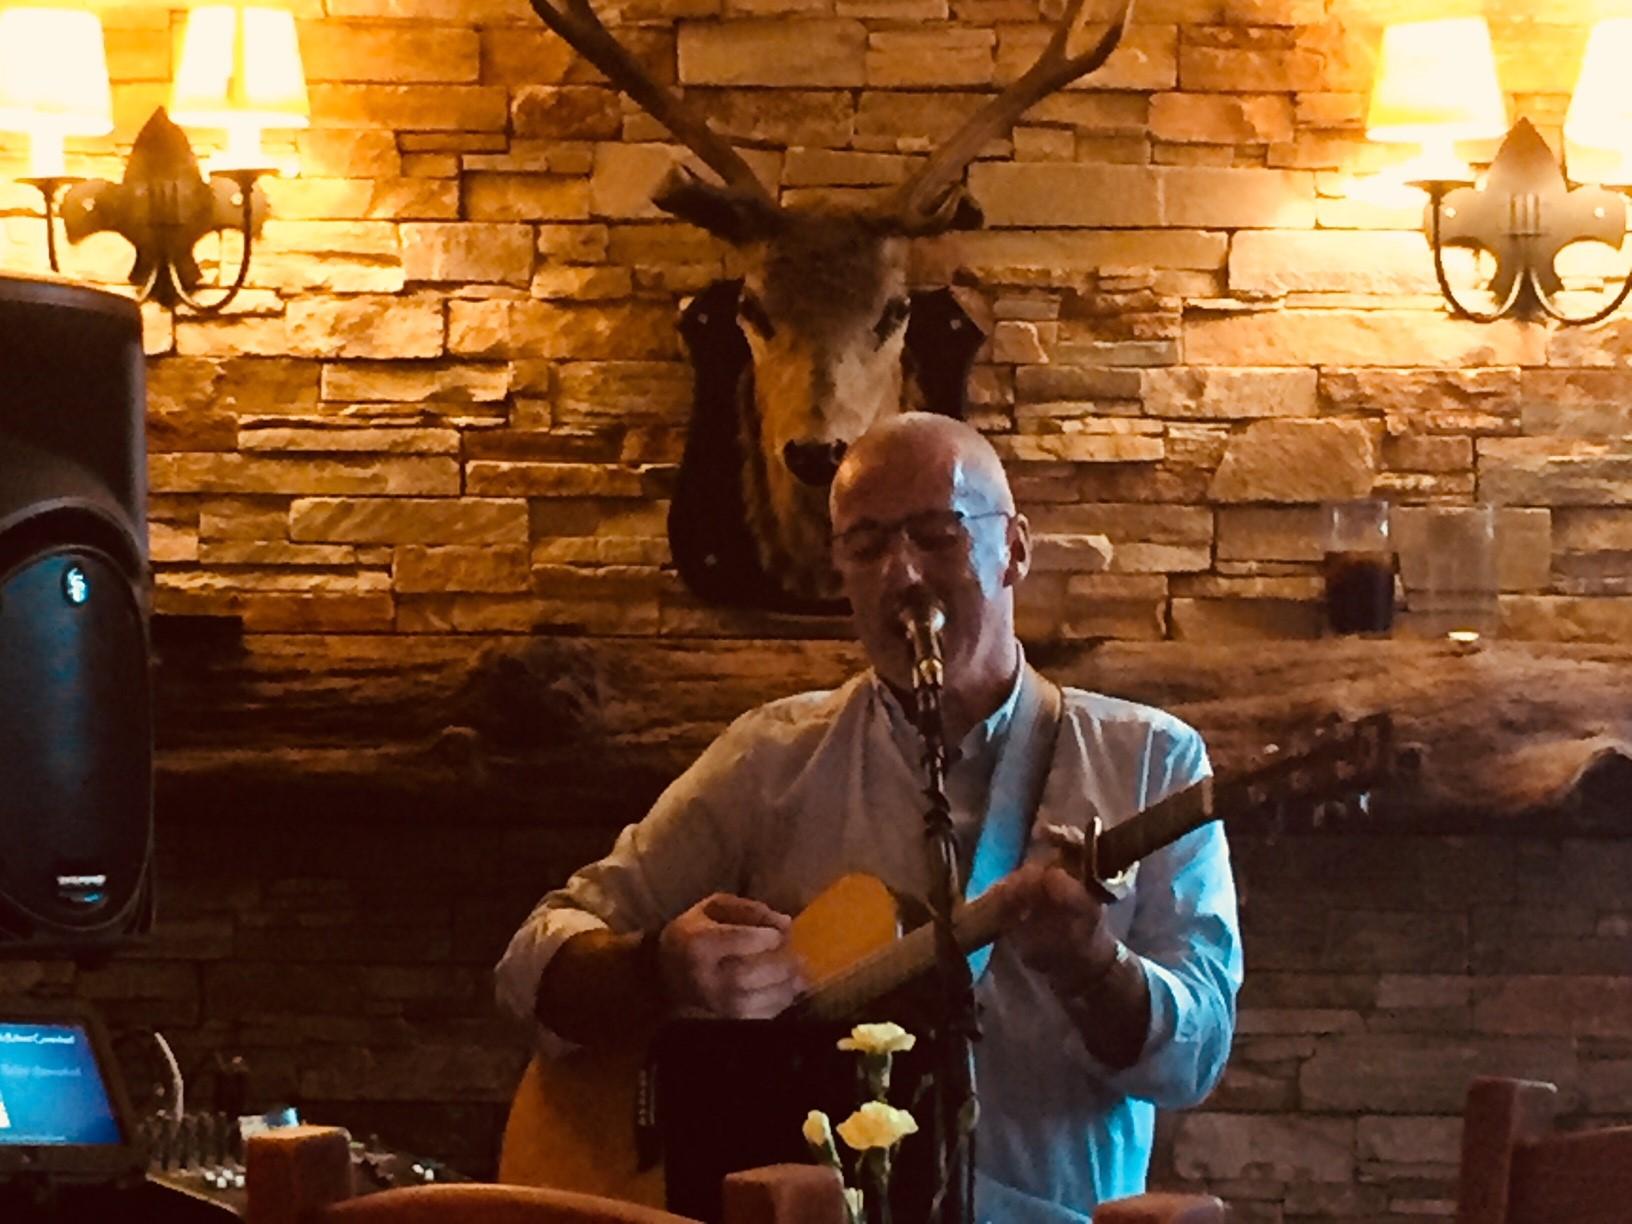 HeraldScotland: The Inn on Loch Lomond  Review: The Inn on Loch Lomond 8043625